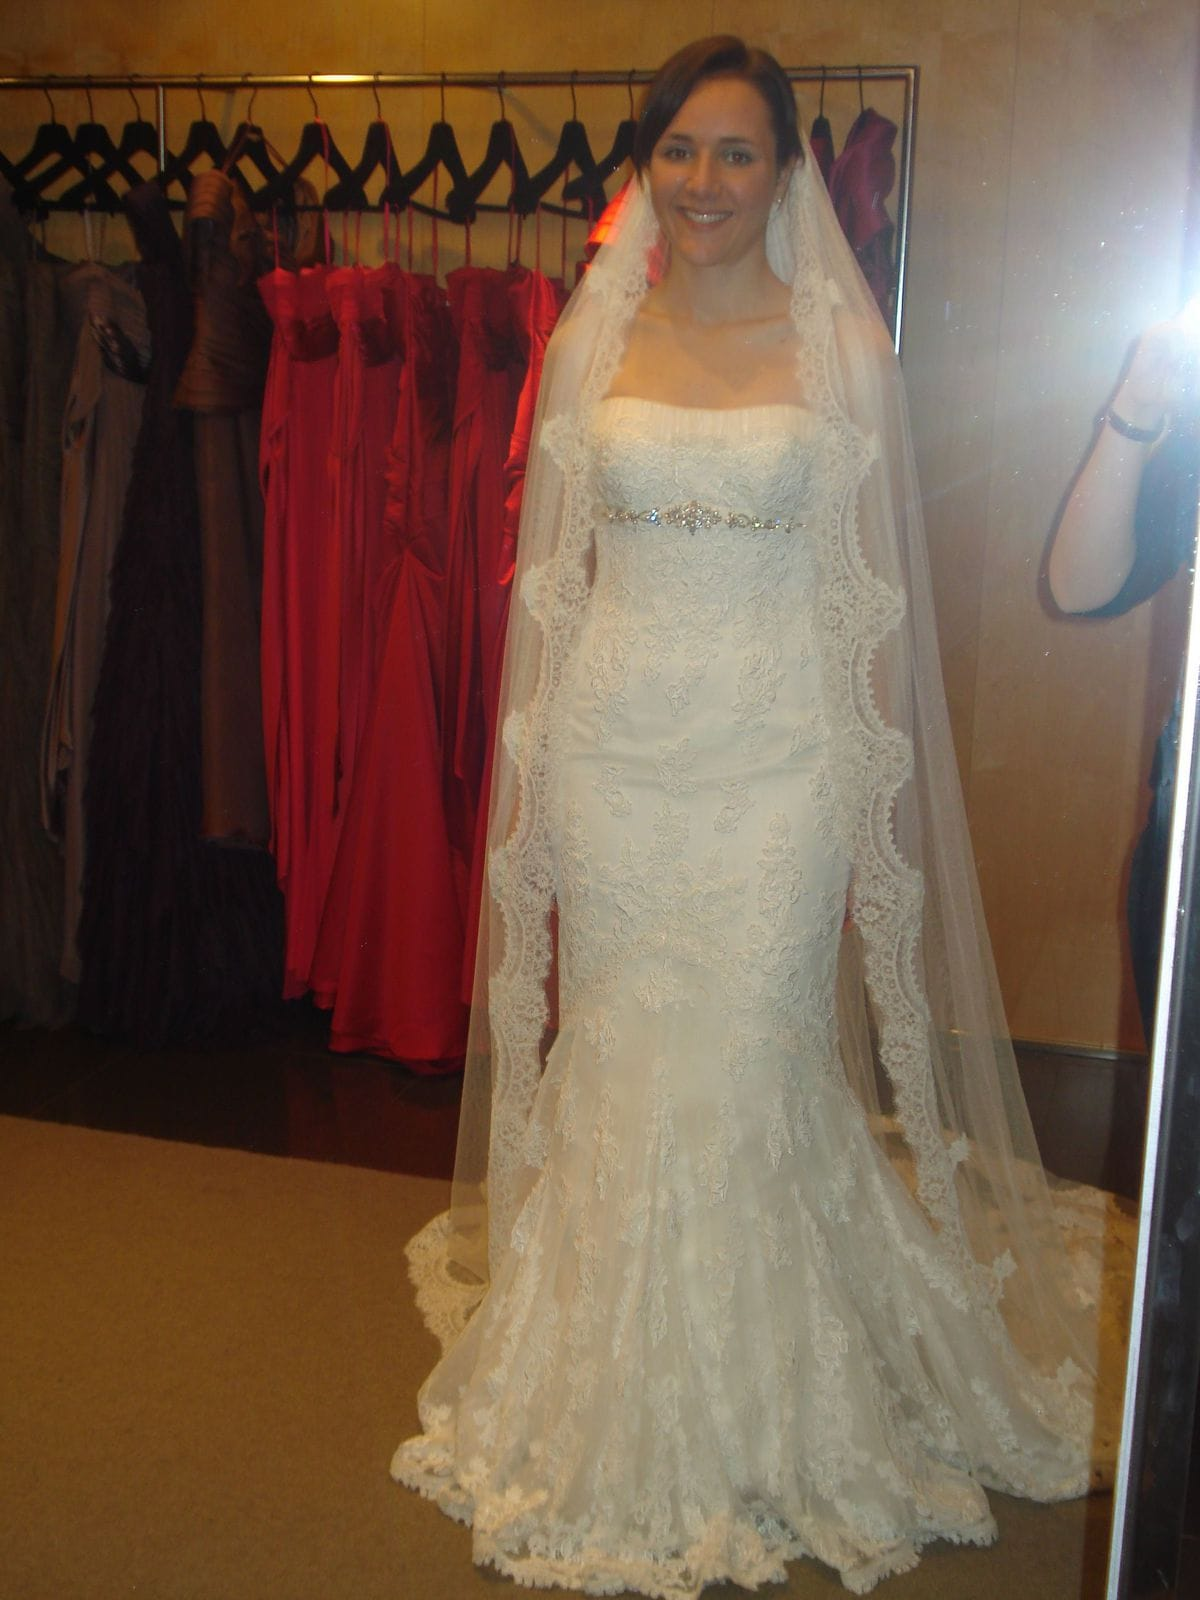 buying my wedding dress in spain - an insider's spain travel blog